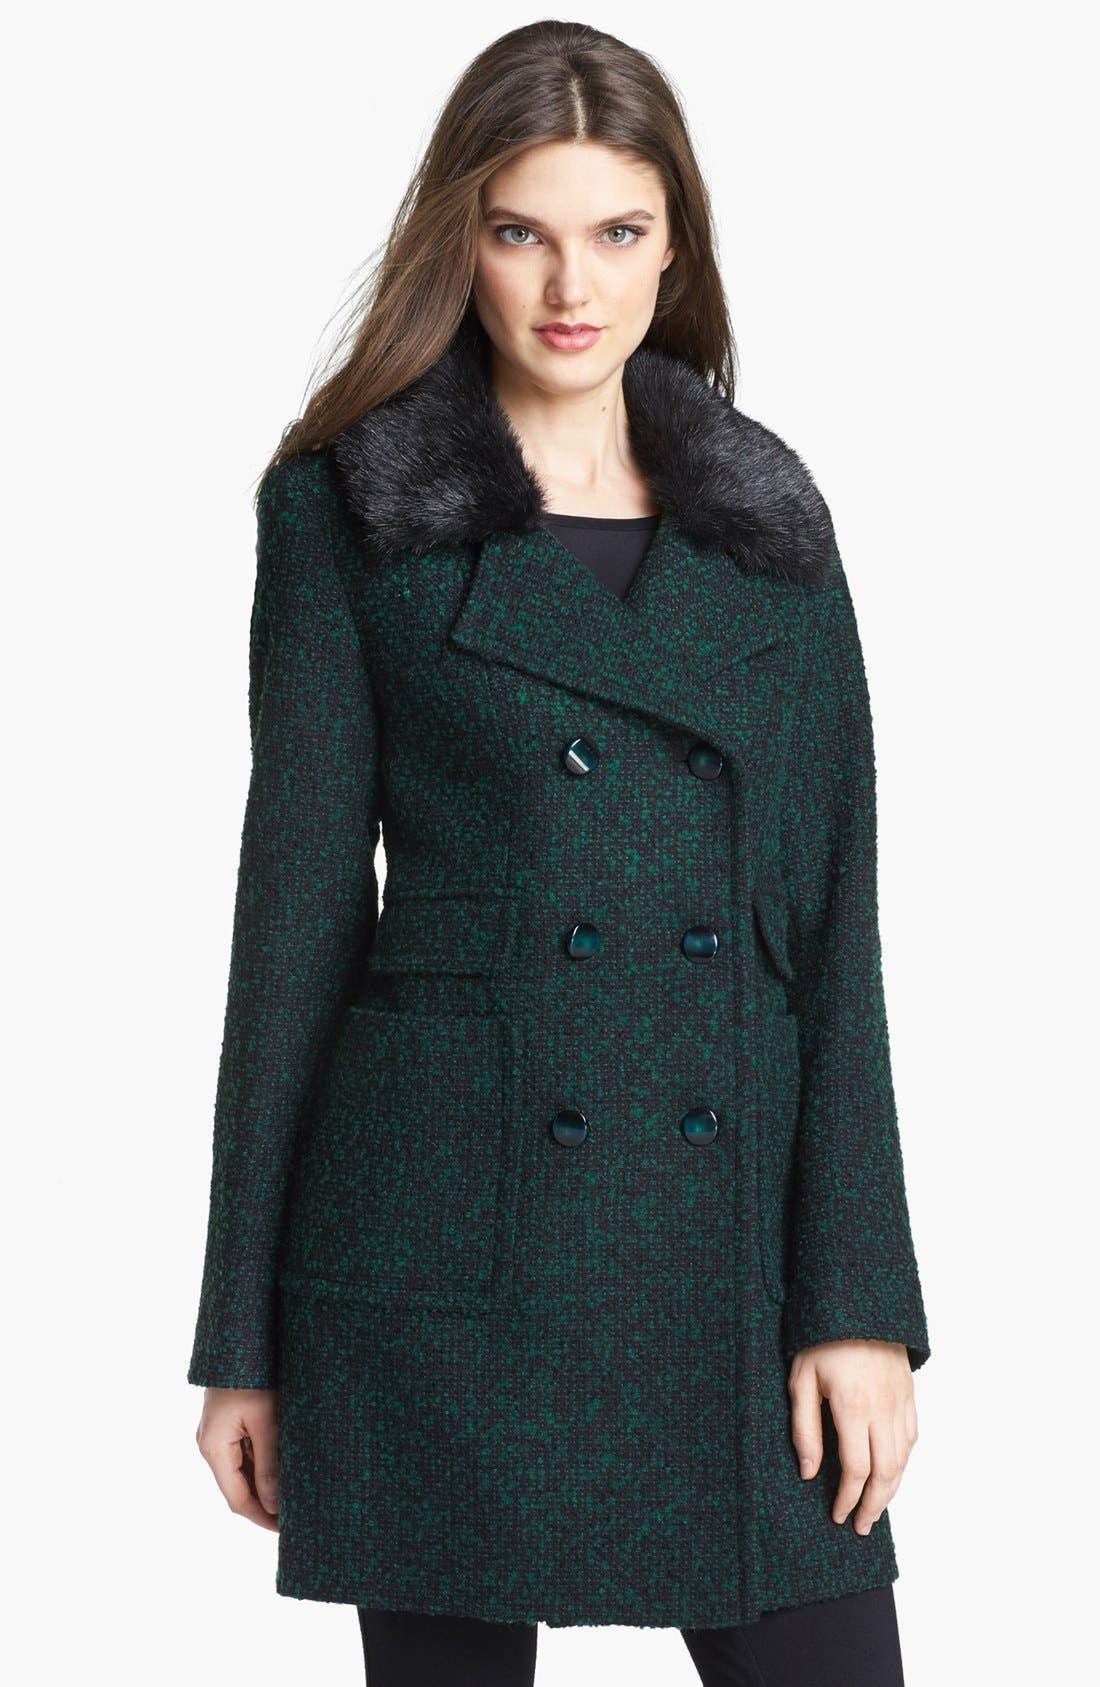 Main Image - Ivanka Trump Detachable Faux Fur Collar Tweed Coat